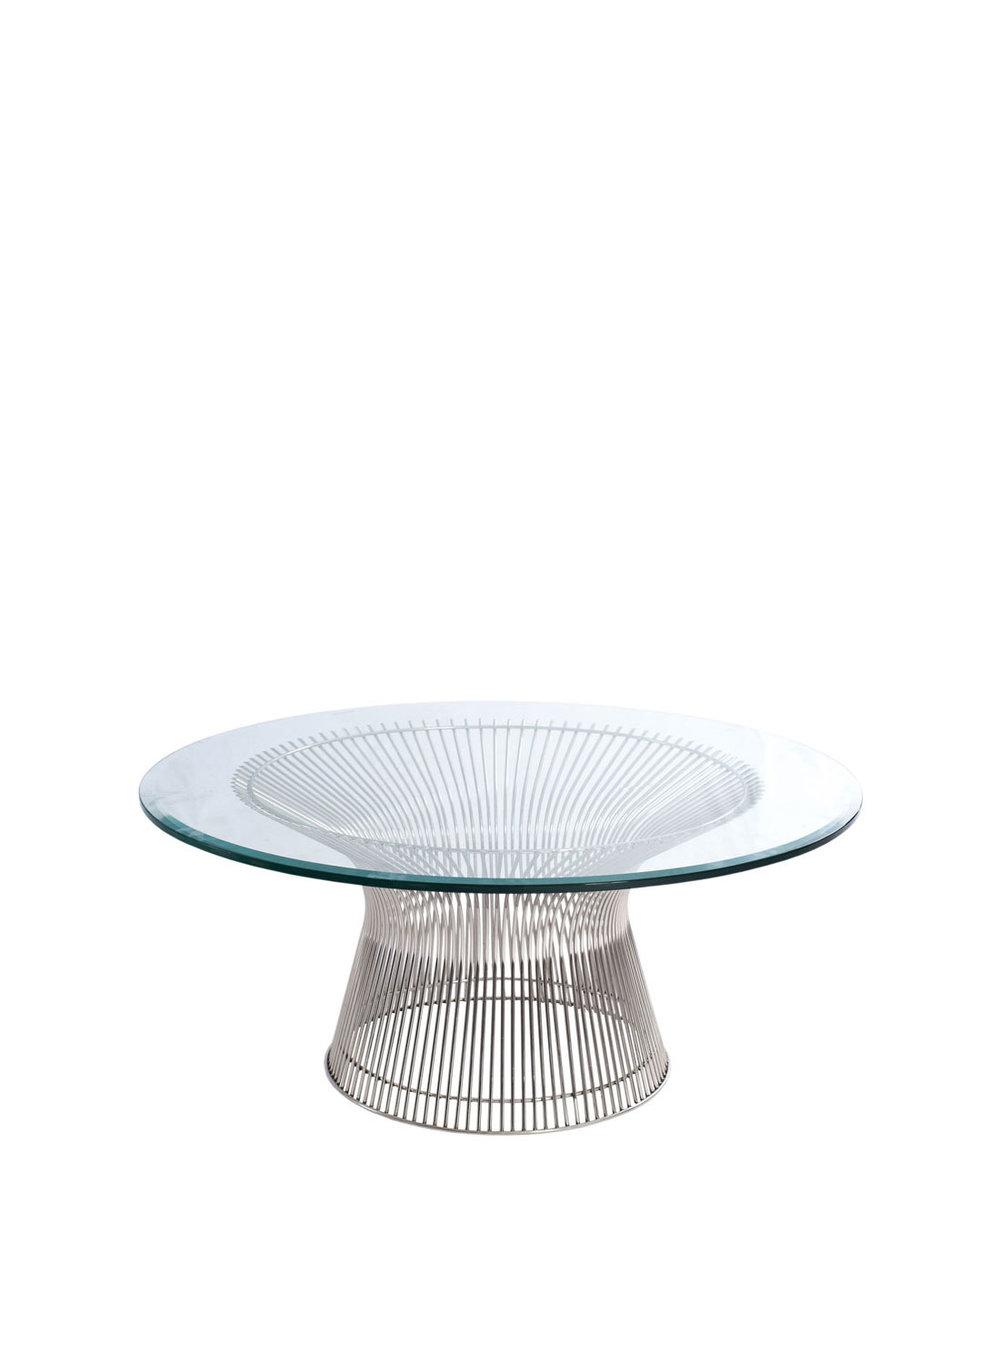 Platner Style Coffee Table (Ireland Exclusive)